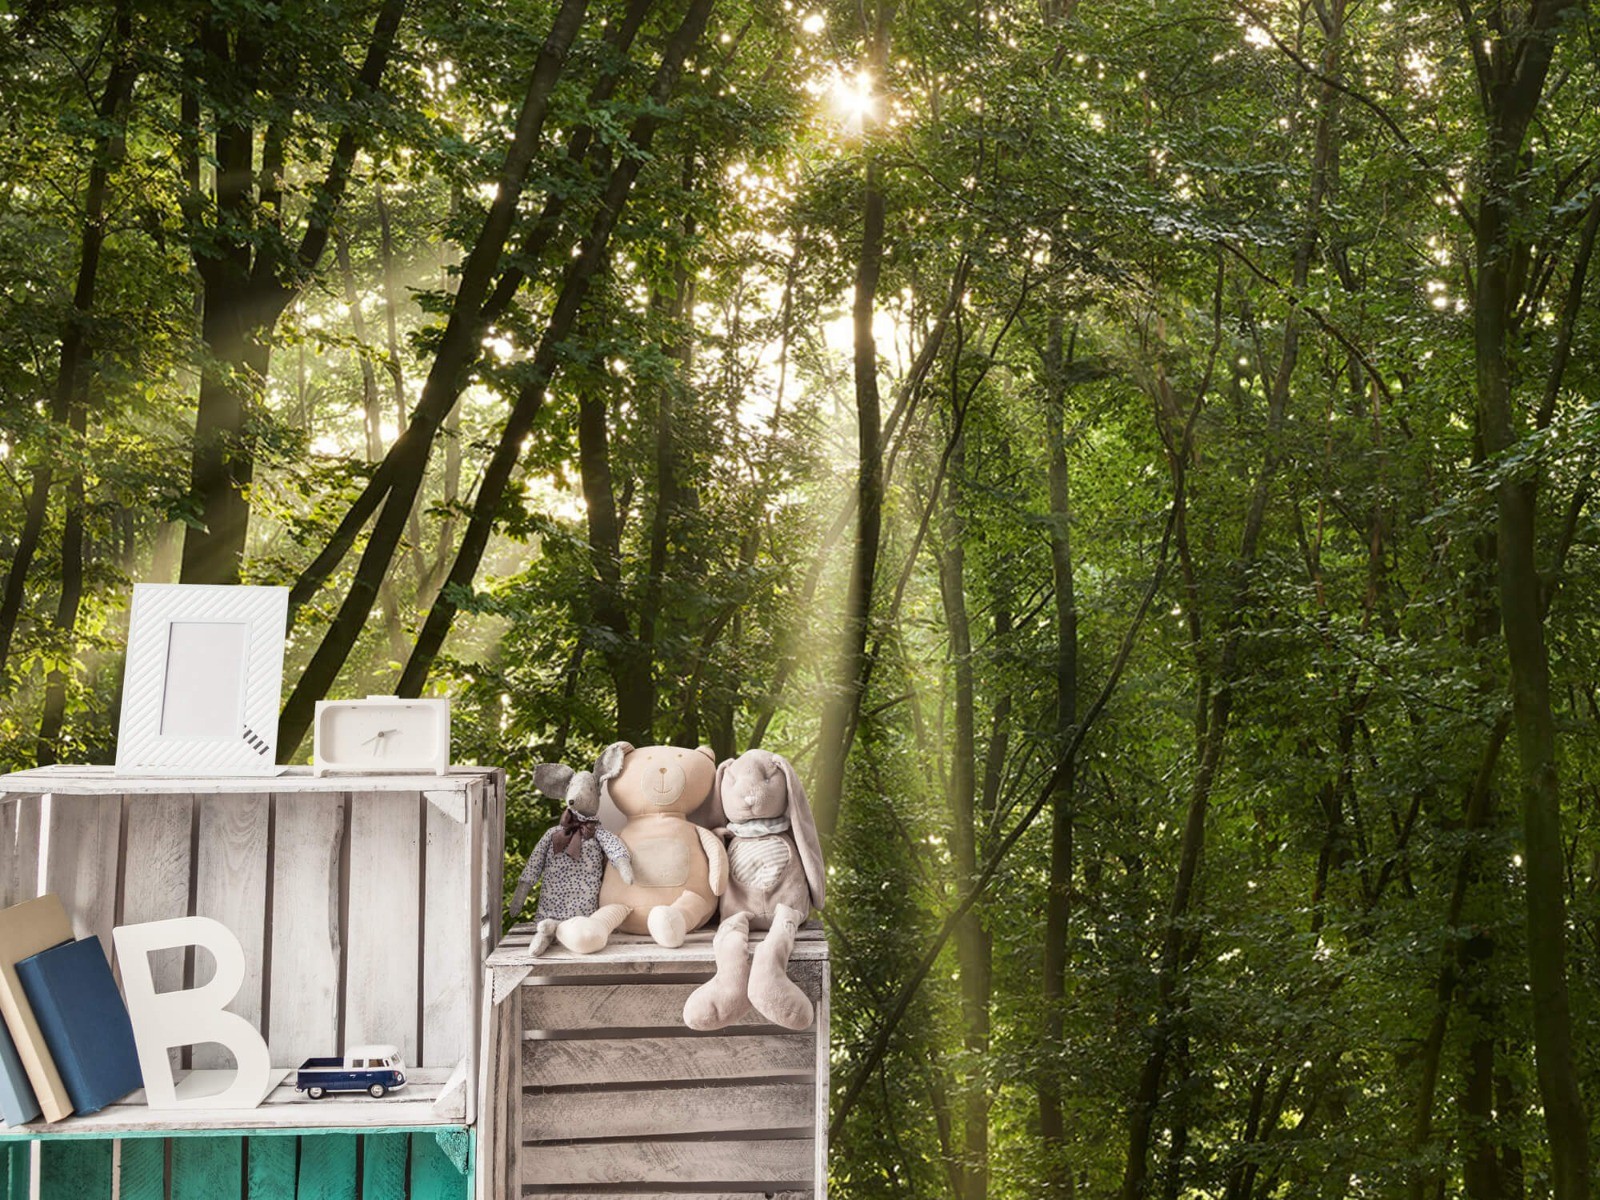 Bomen - Zonnestralen in het bos - Slaapkamer 19